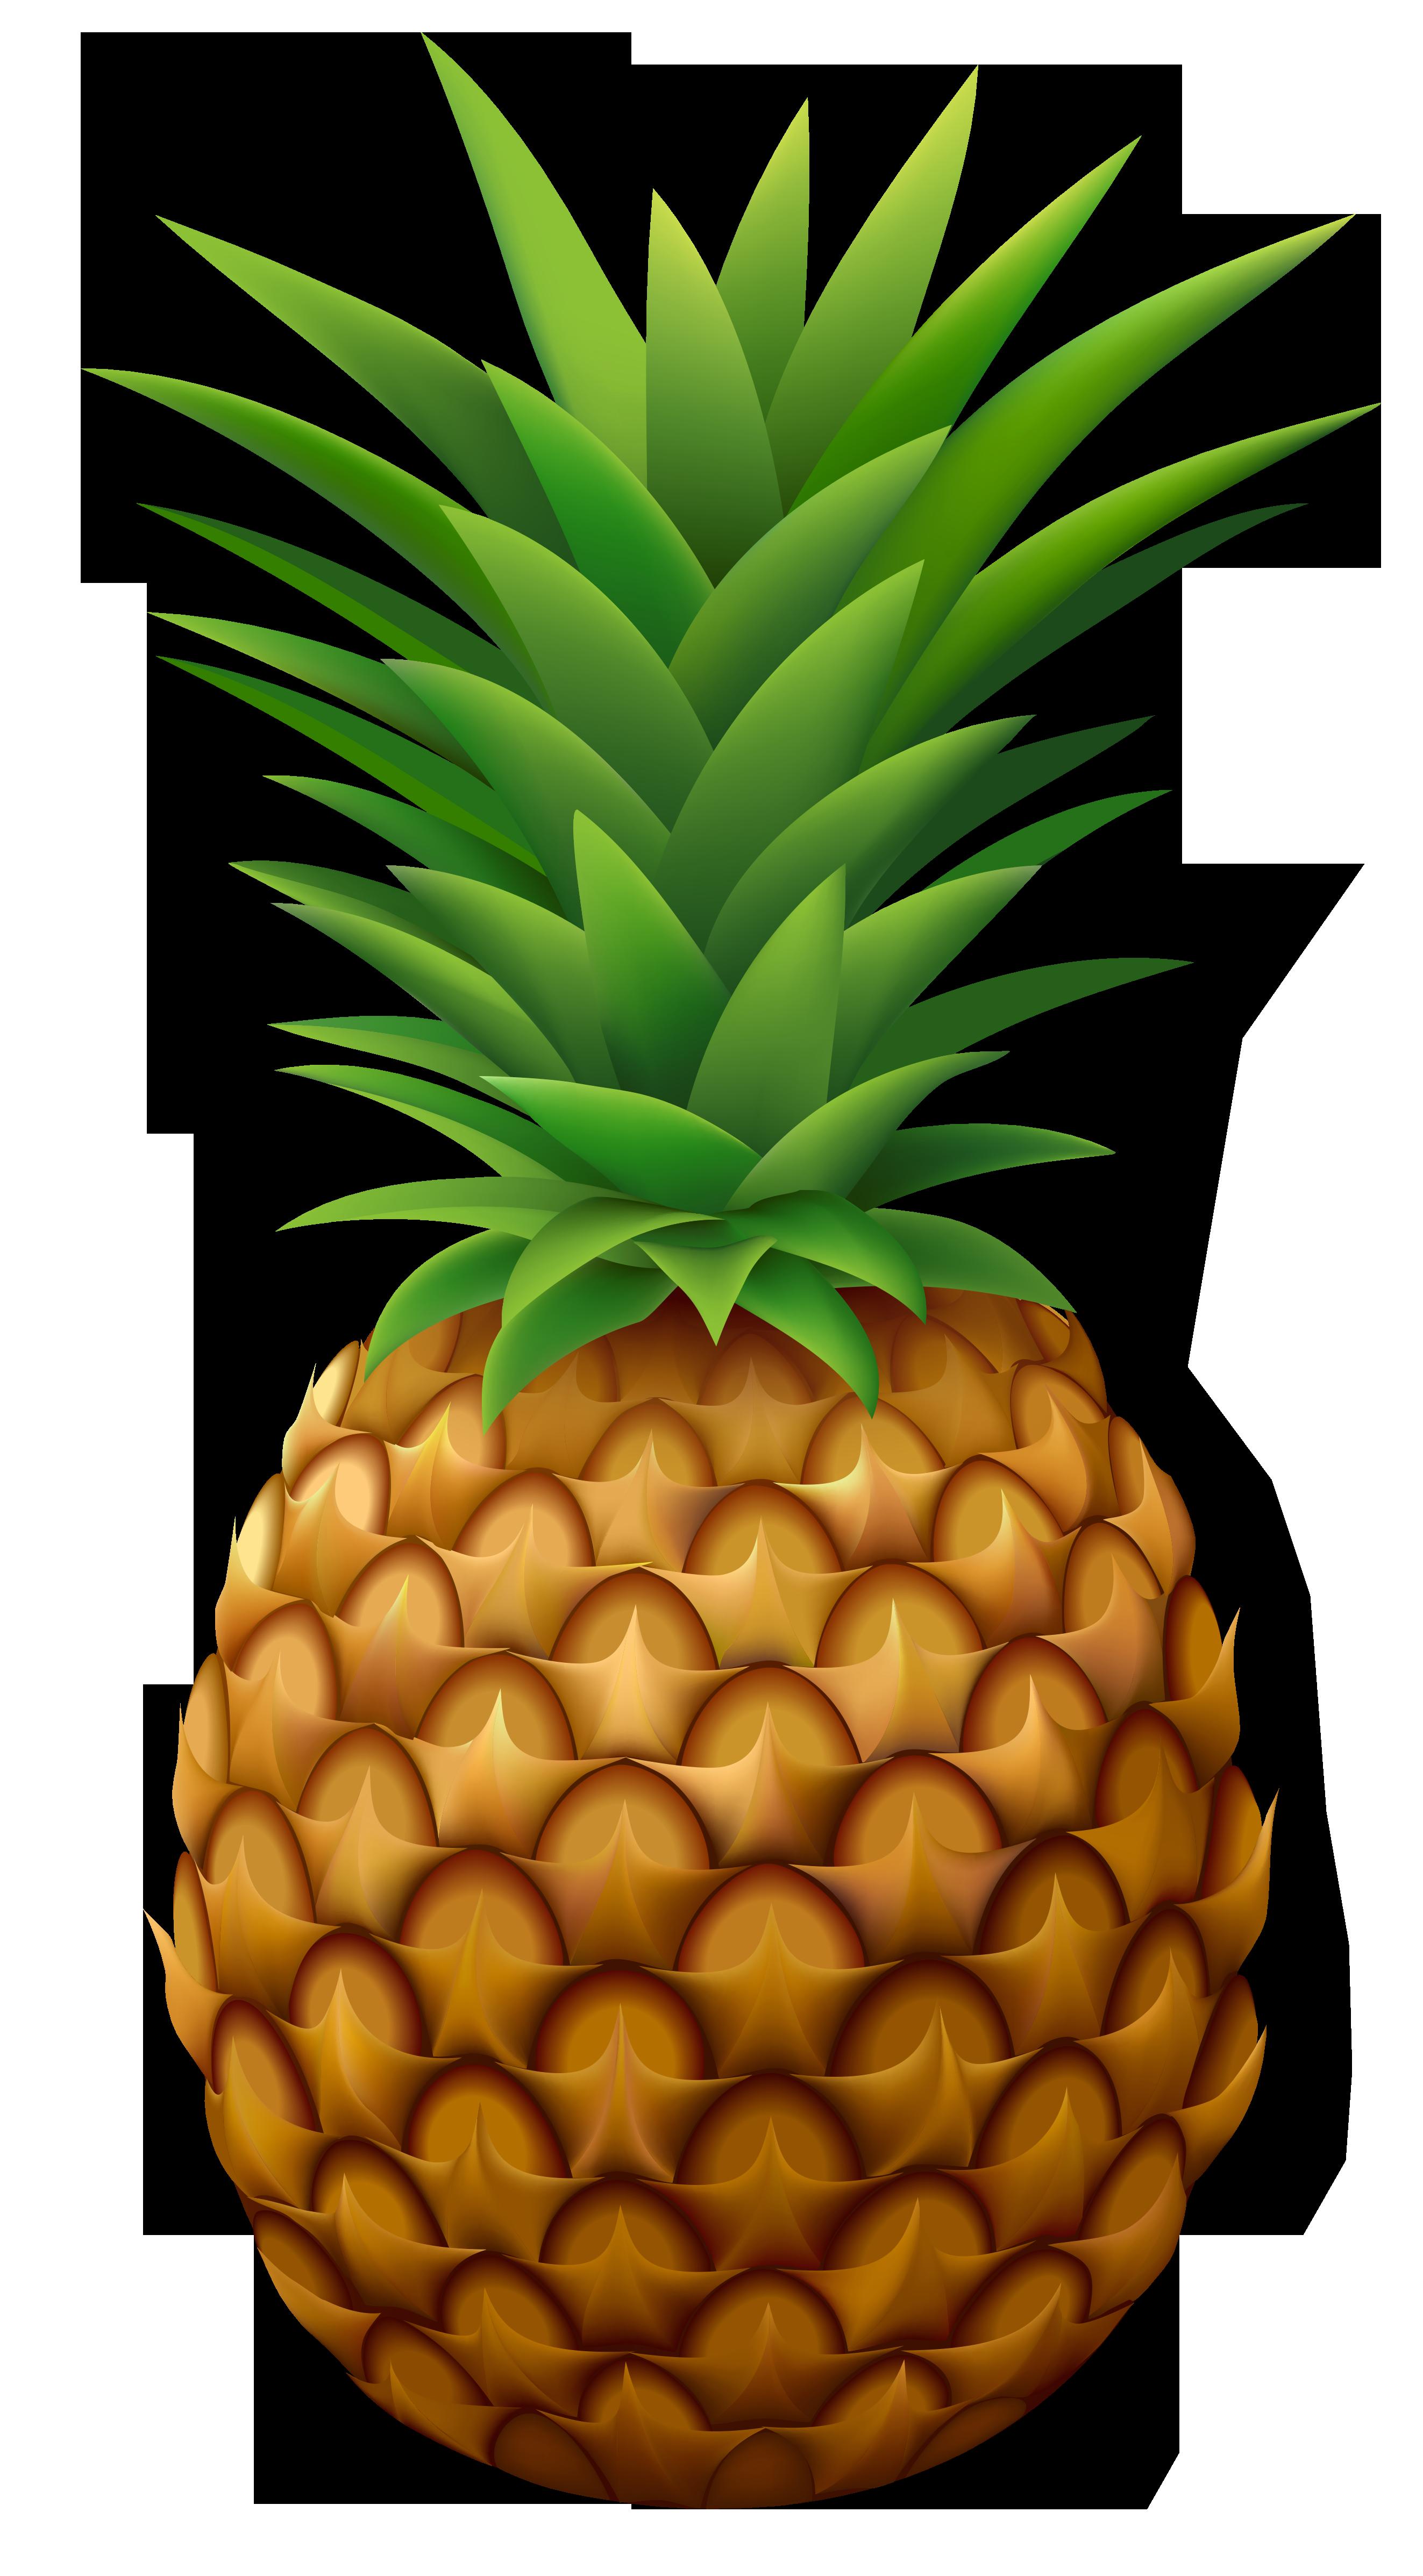 Sour Juice Pineapple Food Clip art.